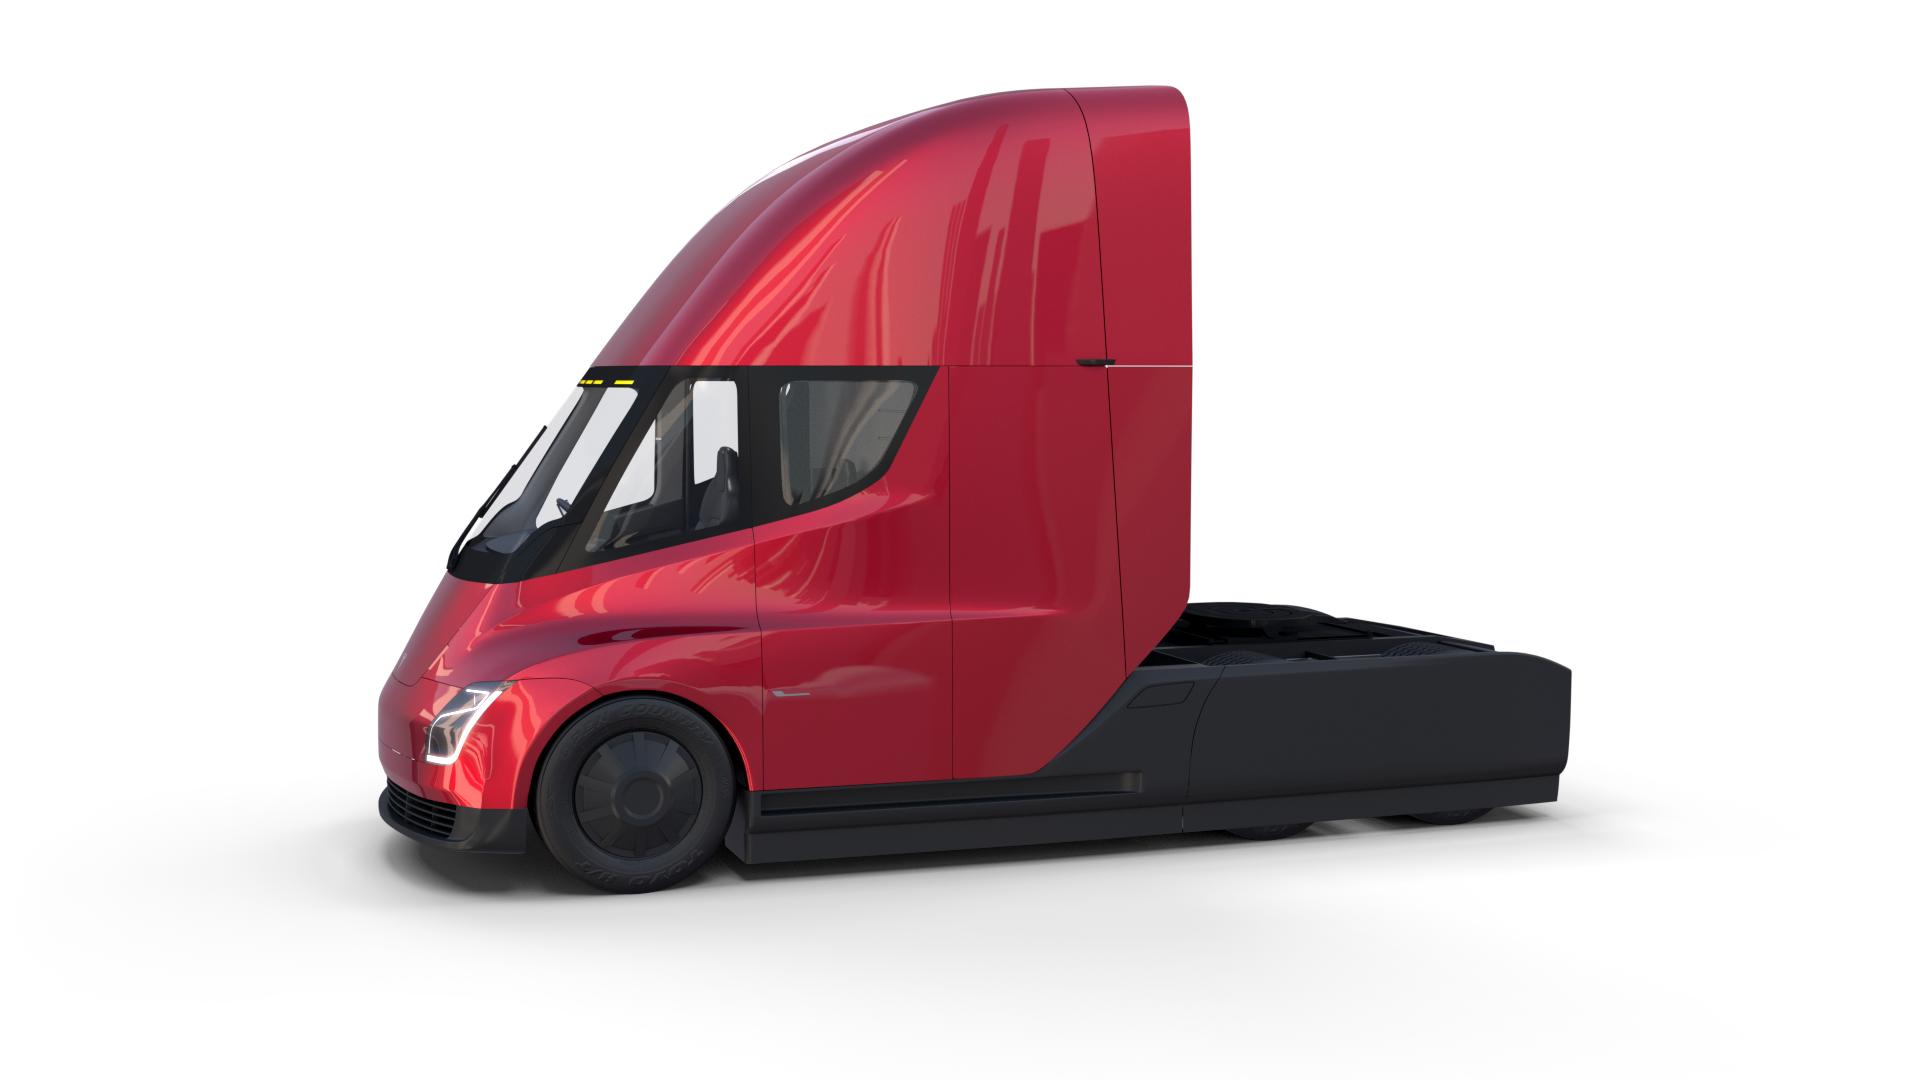 Tesla Semi Truck With Interior Red Semi Trucks Tesla Semi Truck Tesla